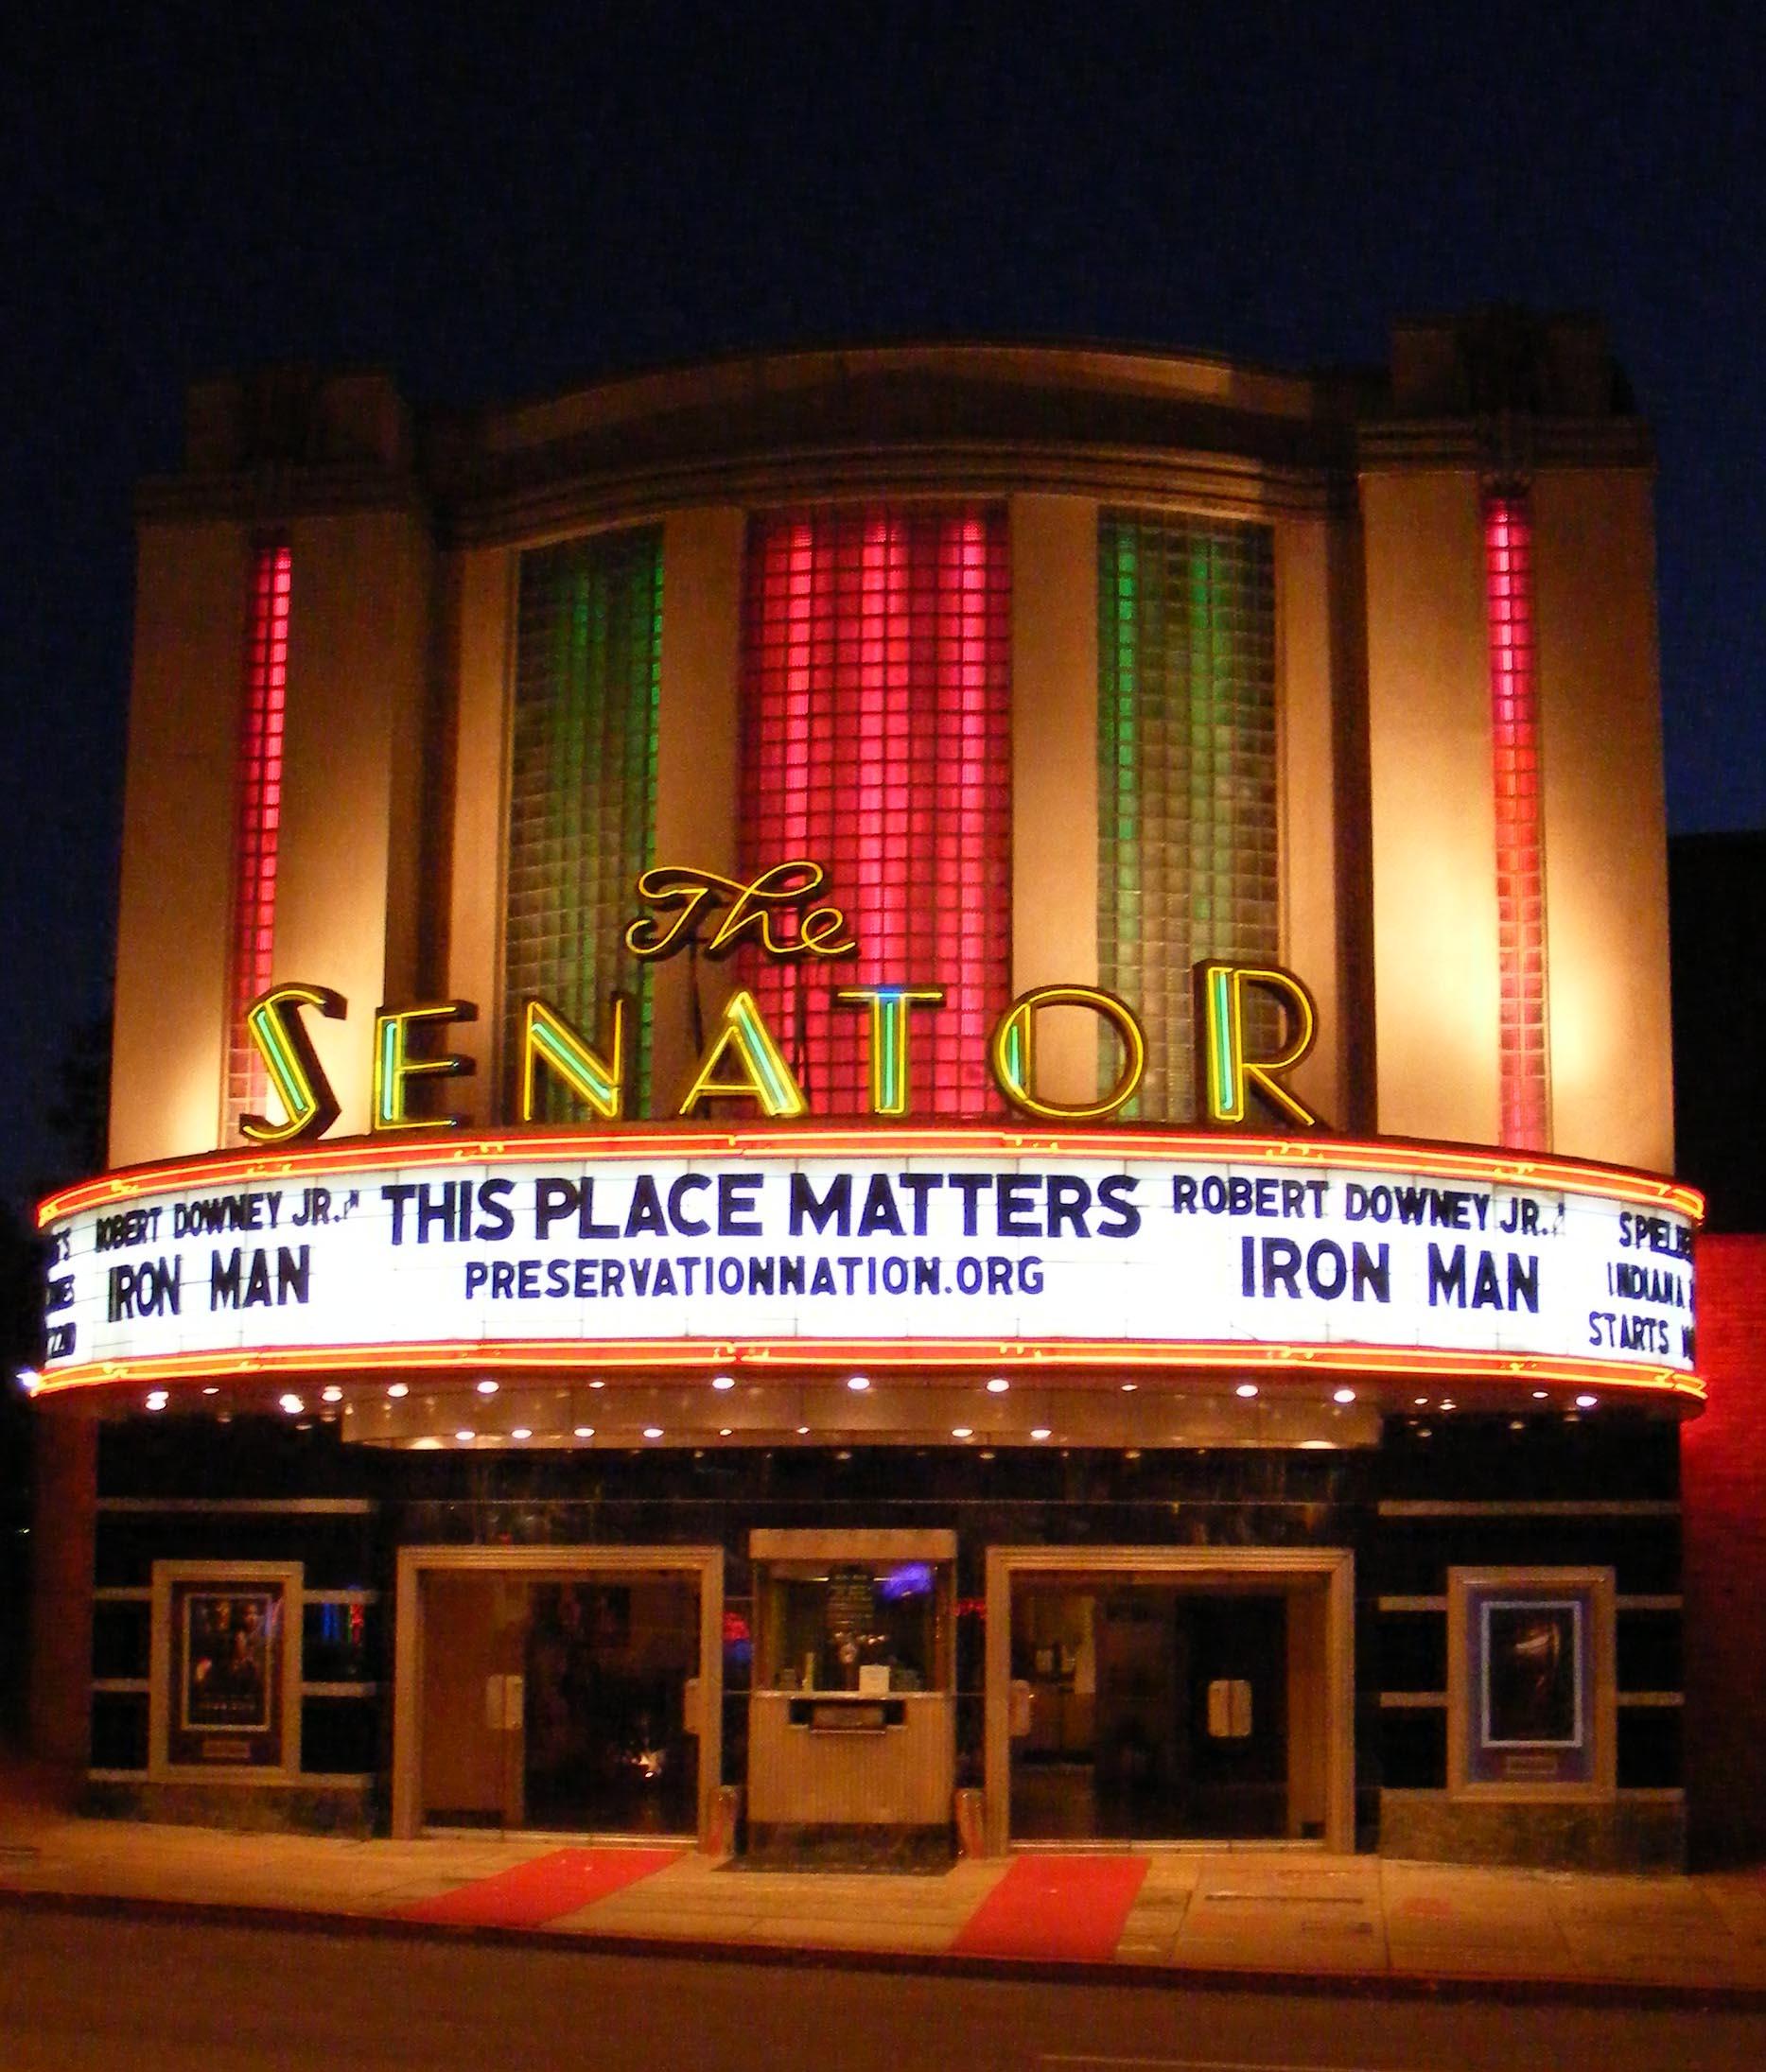 Senator Theater セネター・シアター